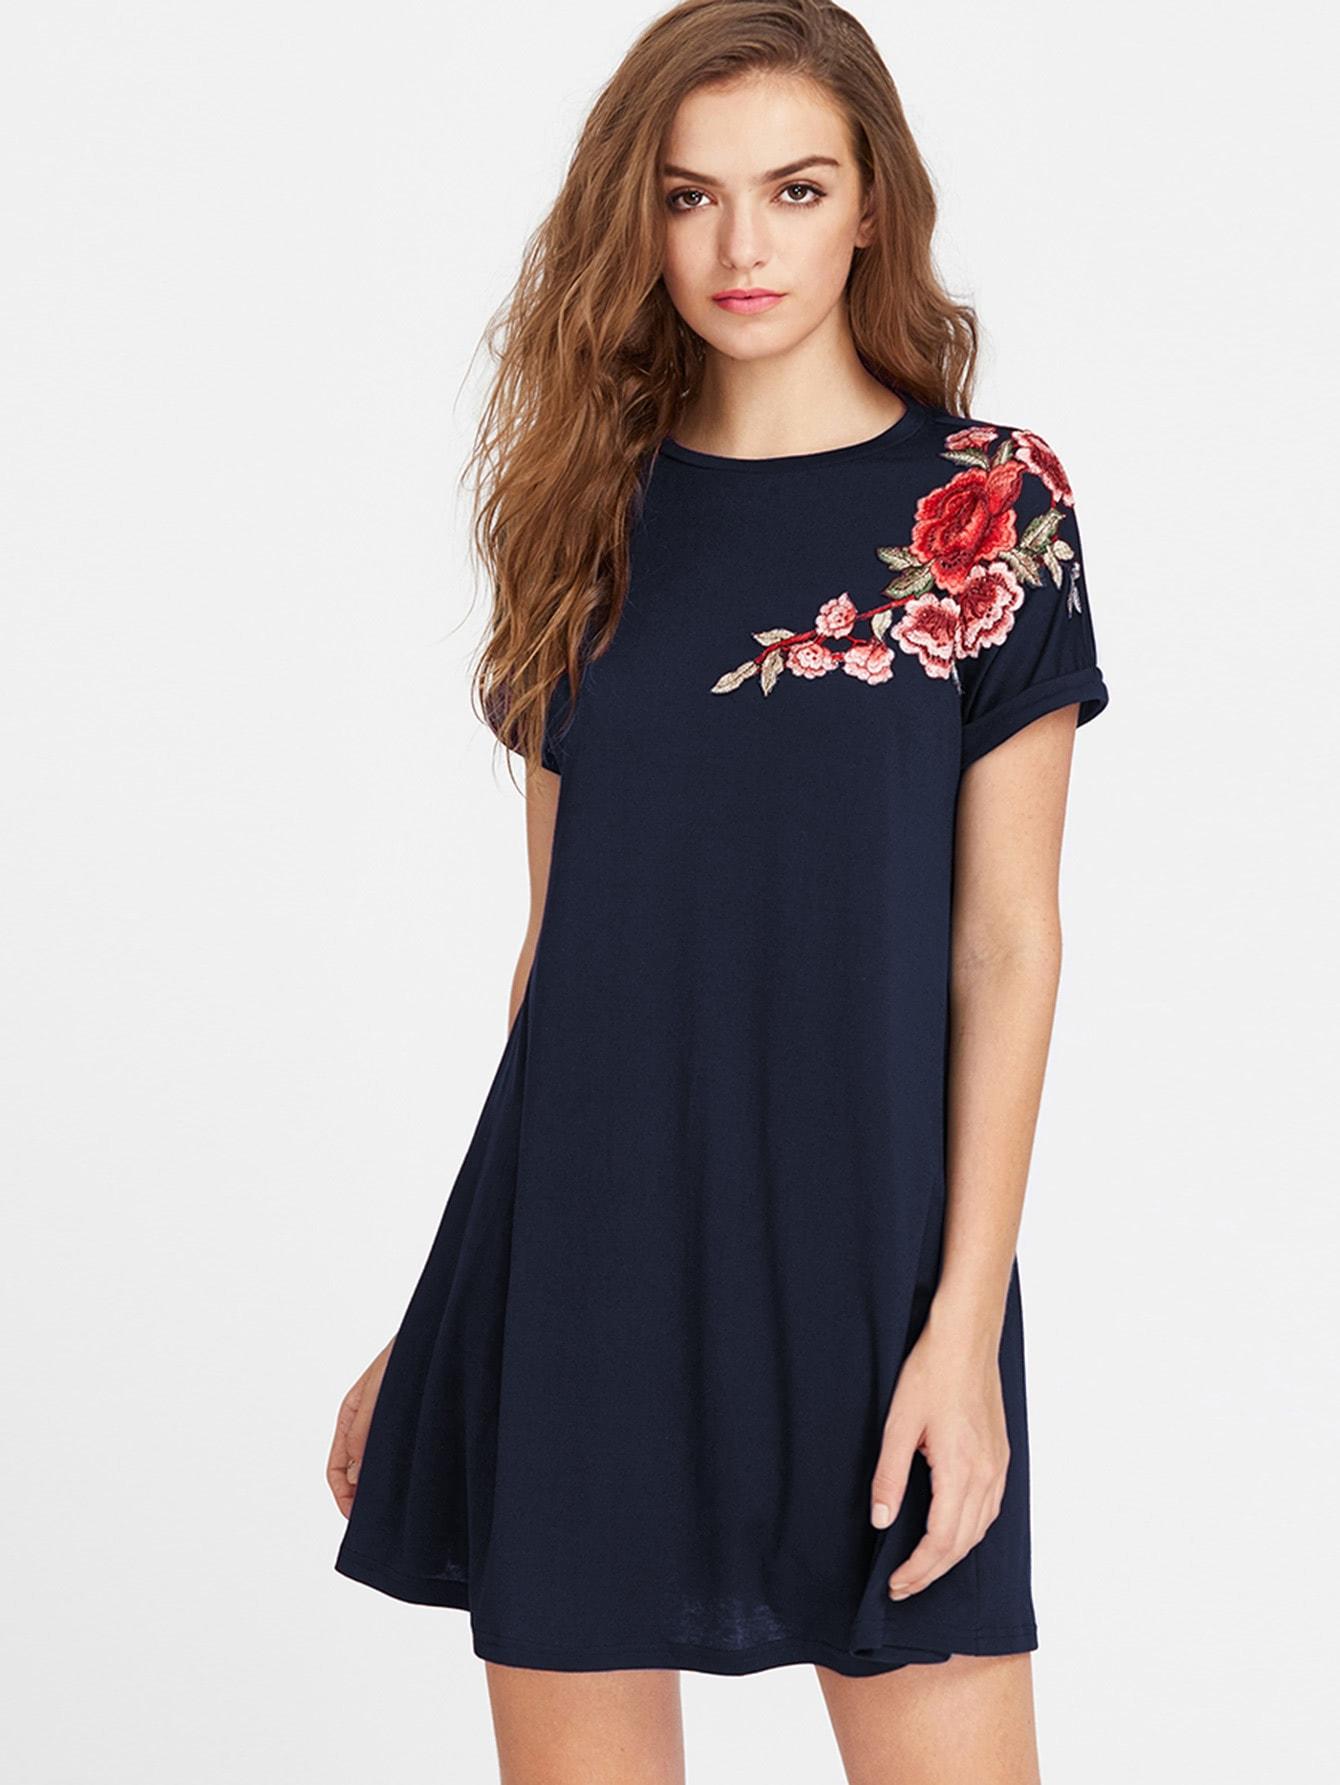 Embroidered Flower Applique Swing Tee Dress dress170711708